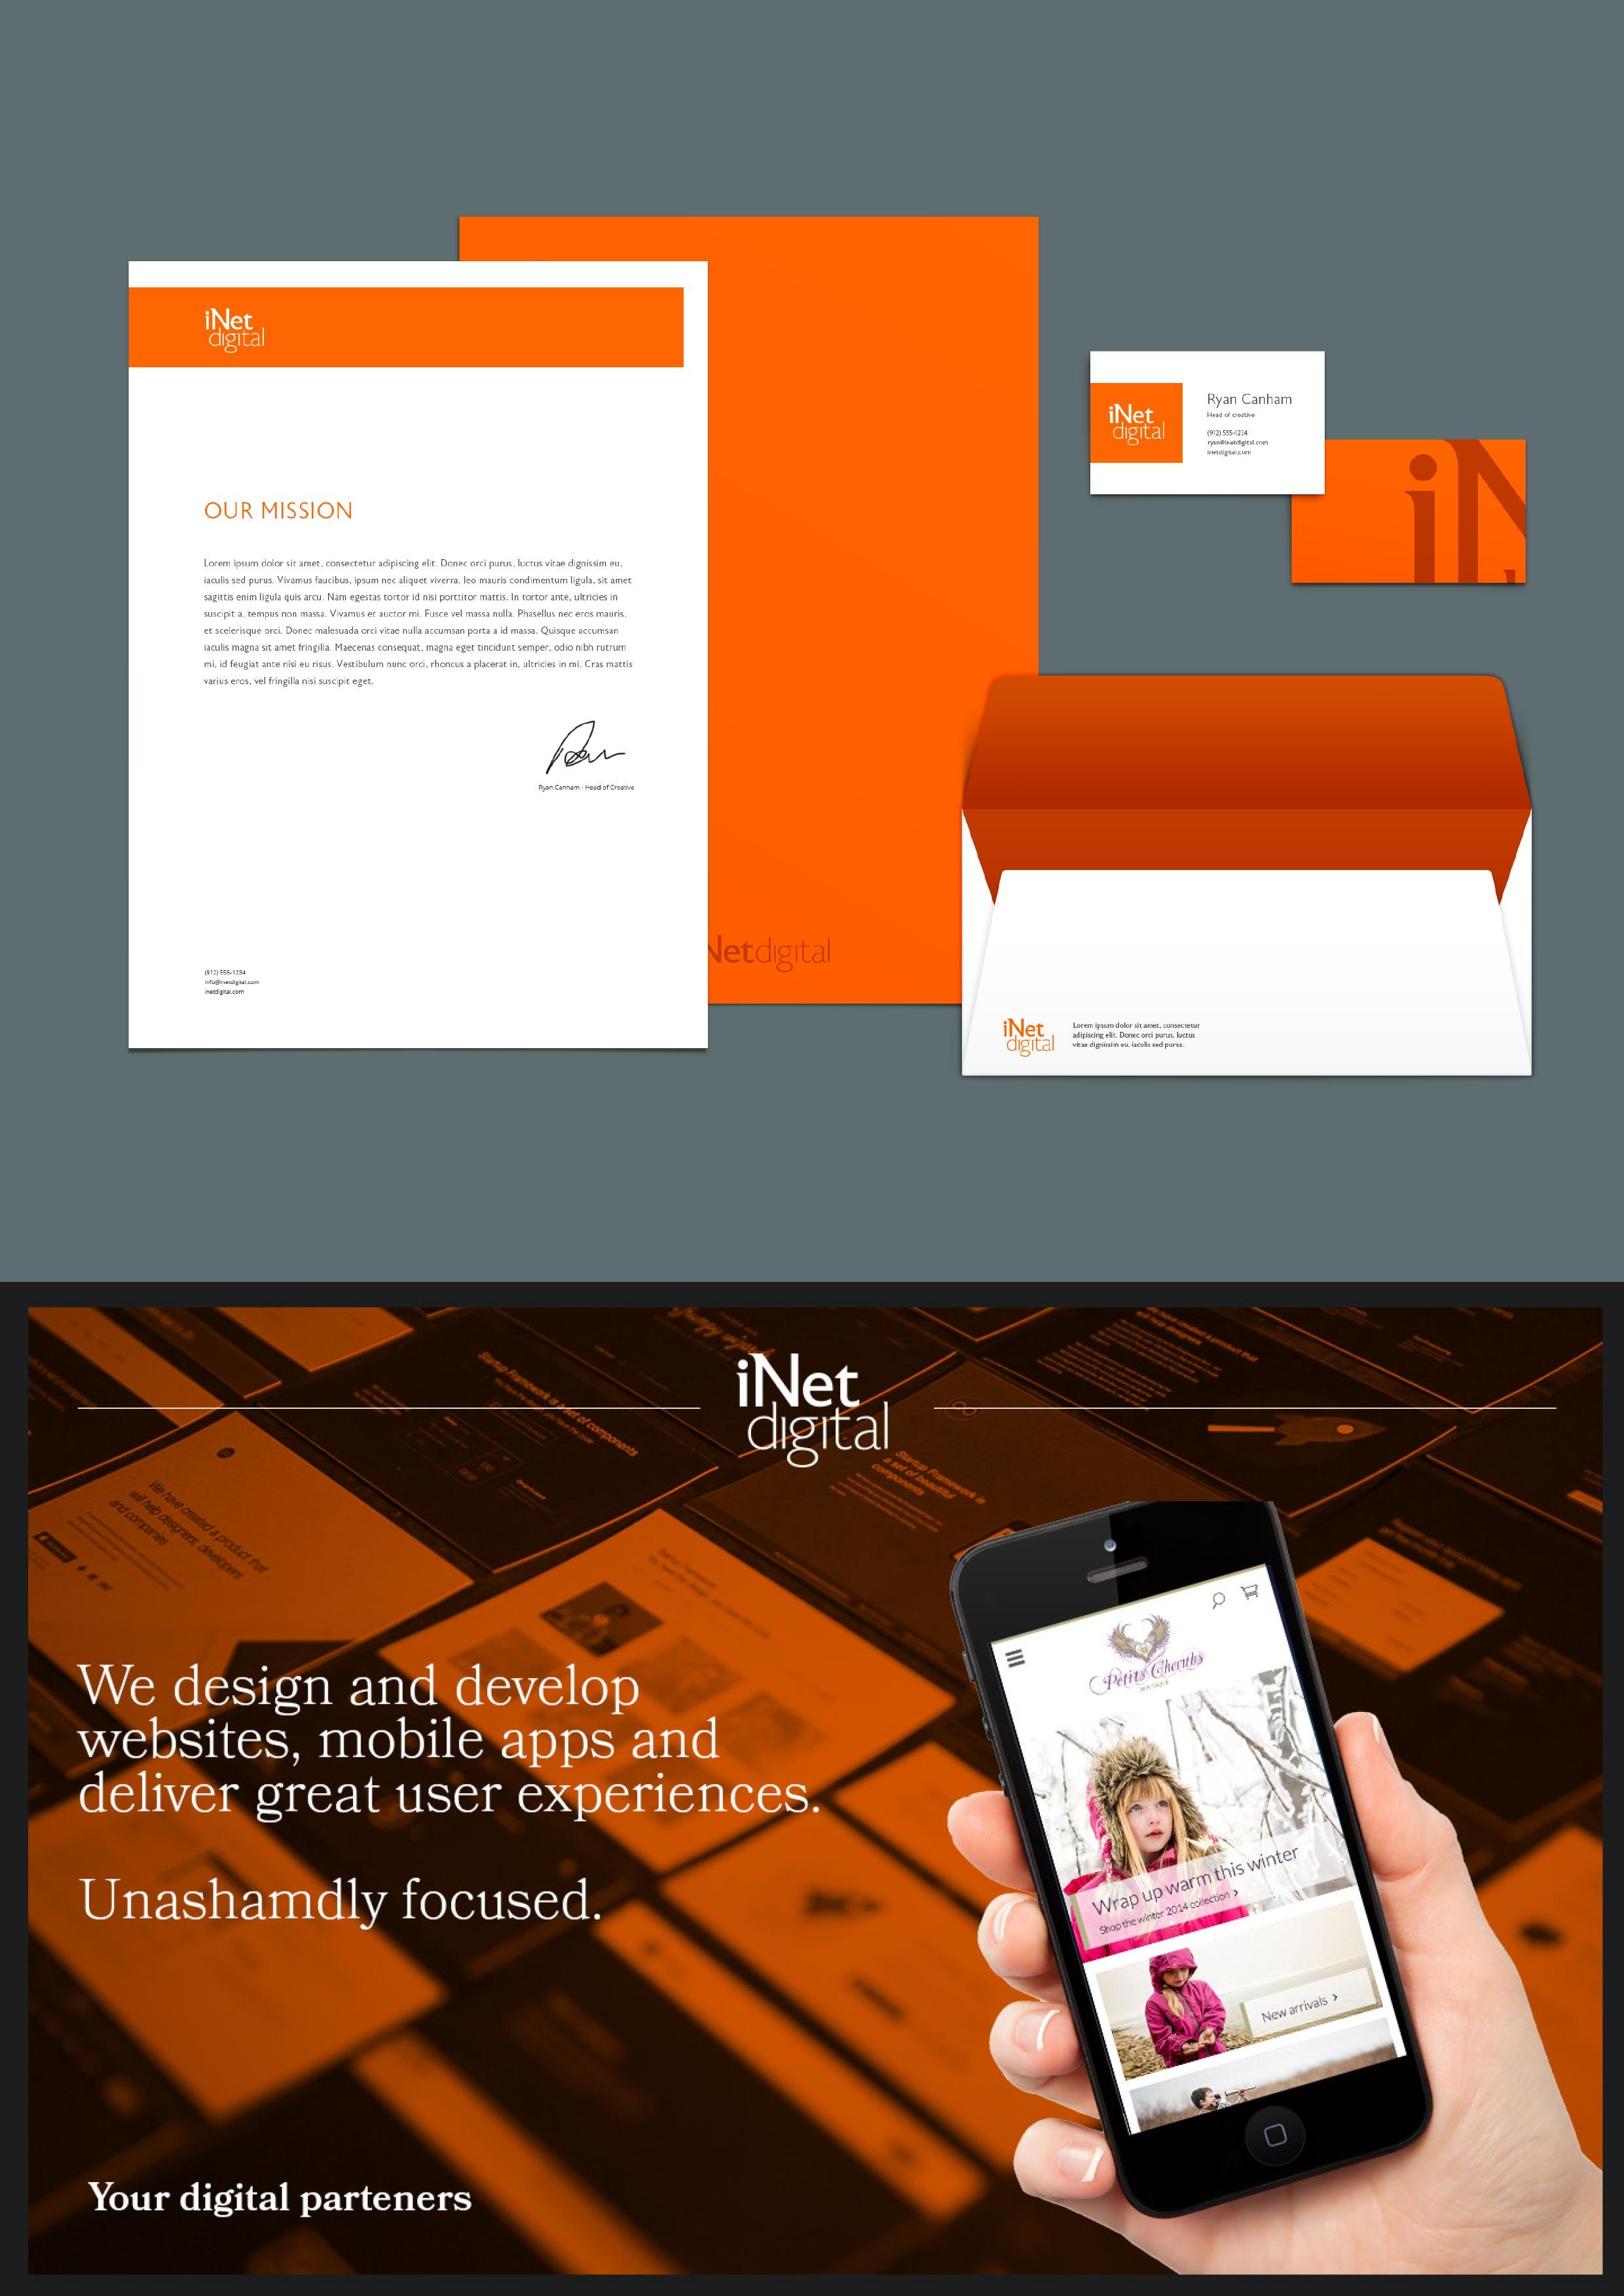 iNet Digital Brand stage